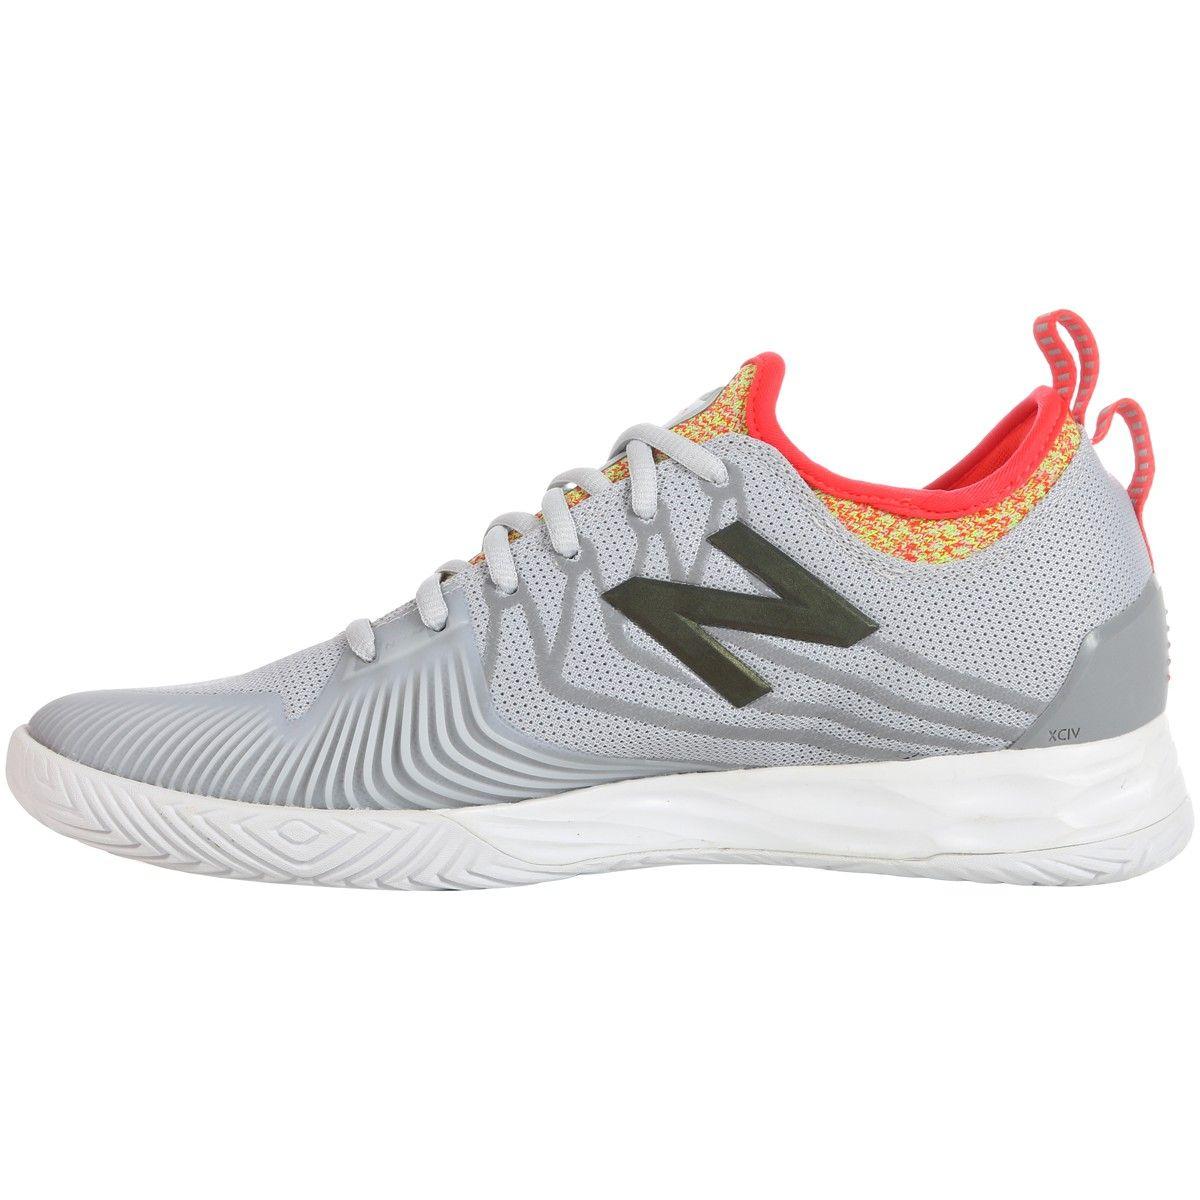 Zapatillas para tenis New balance Lav Fresh Foam